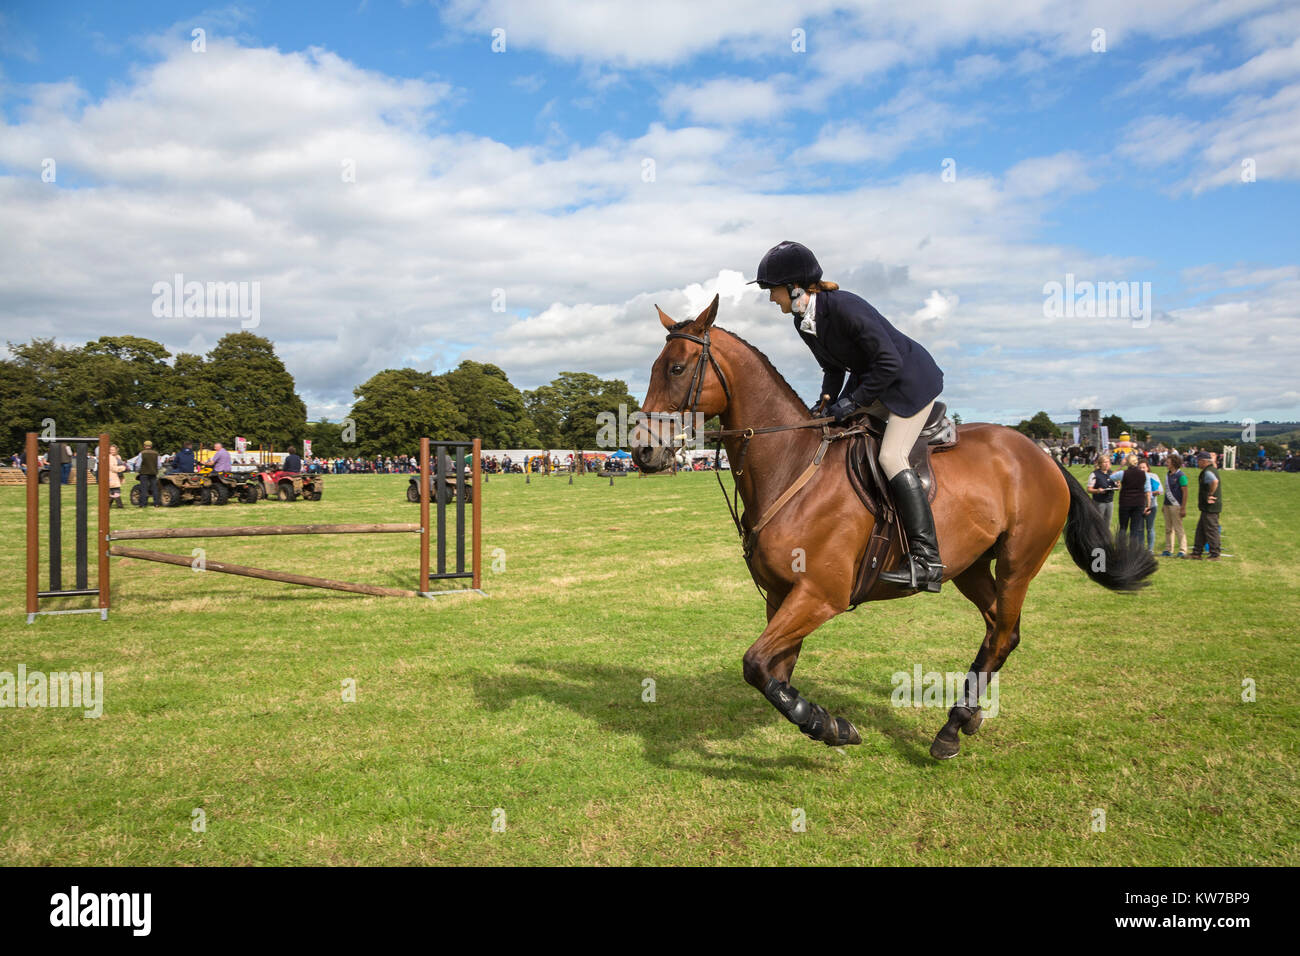 Show Jumping, Bellingham Show, Bellingham, Northumberland, Regno Unito, Agosto 2017 Immagini Stock